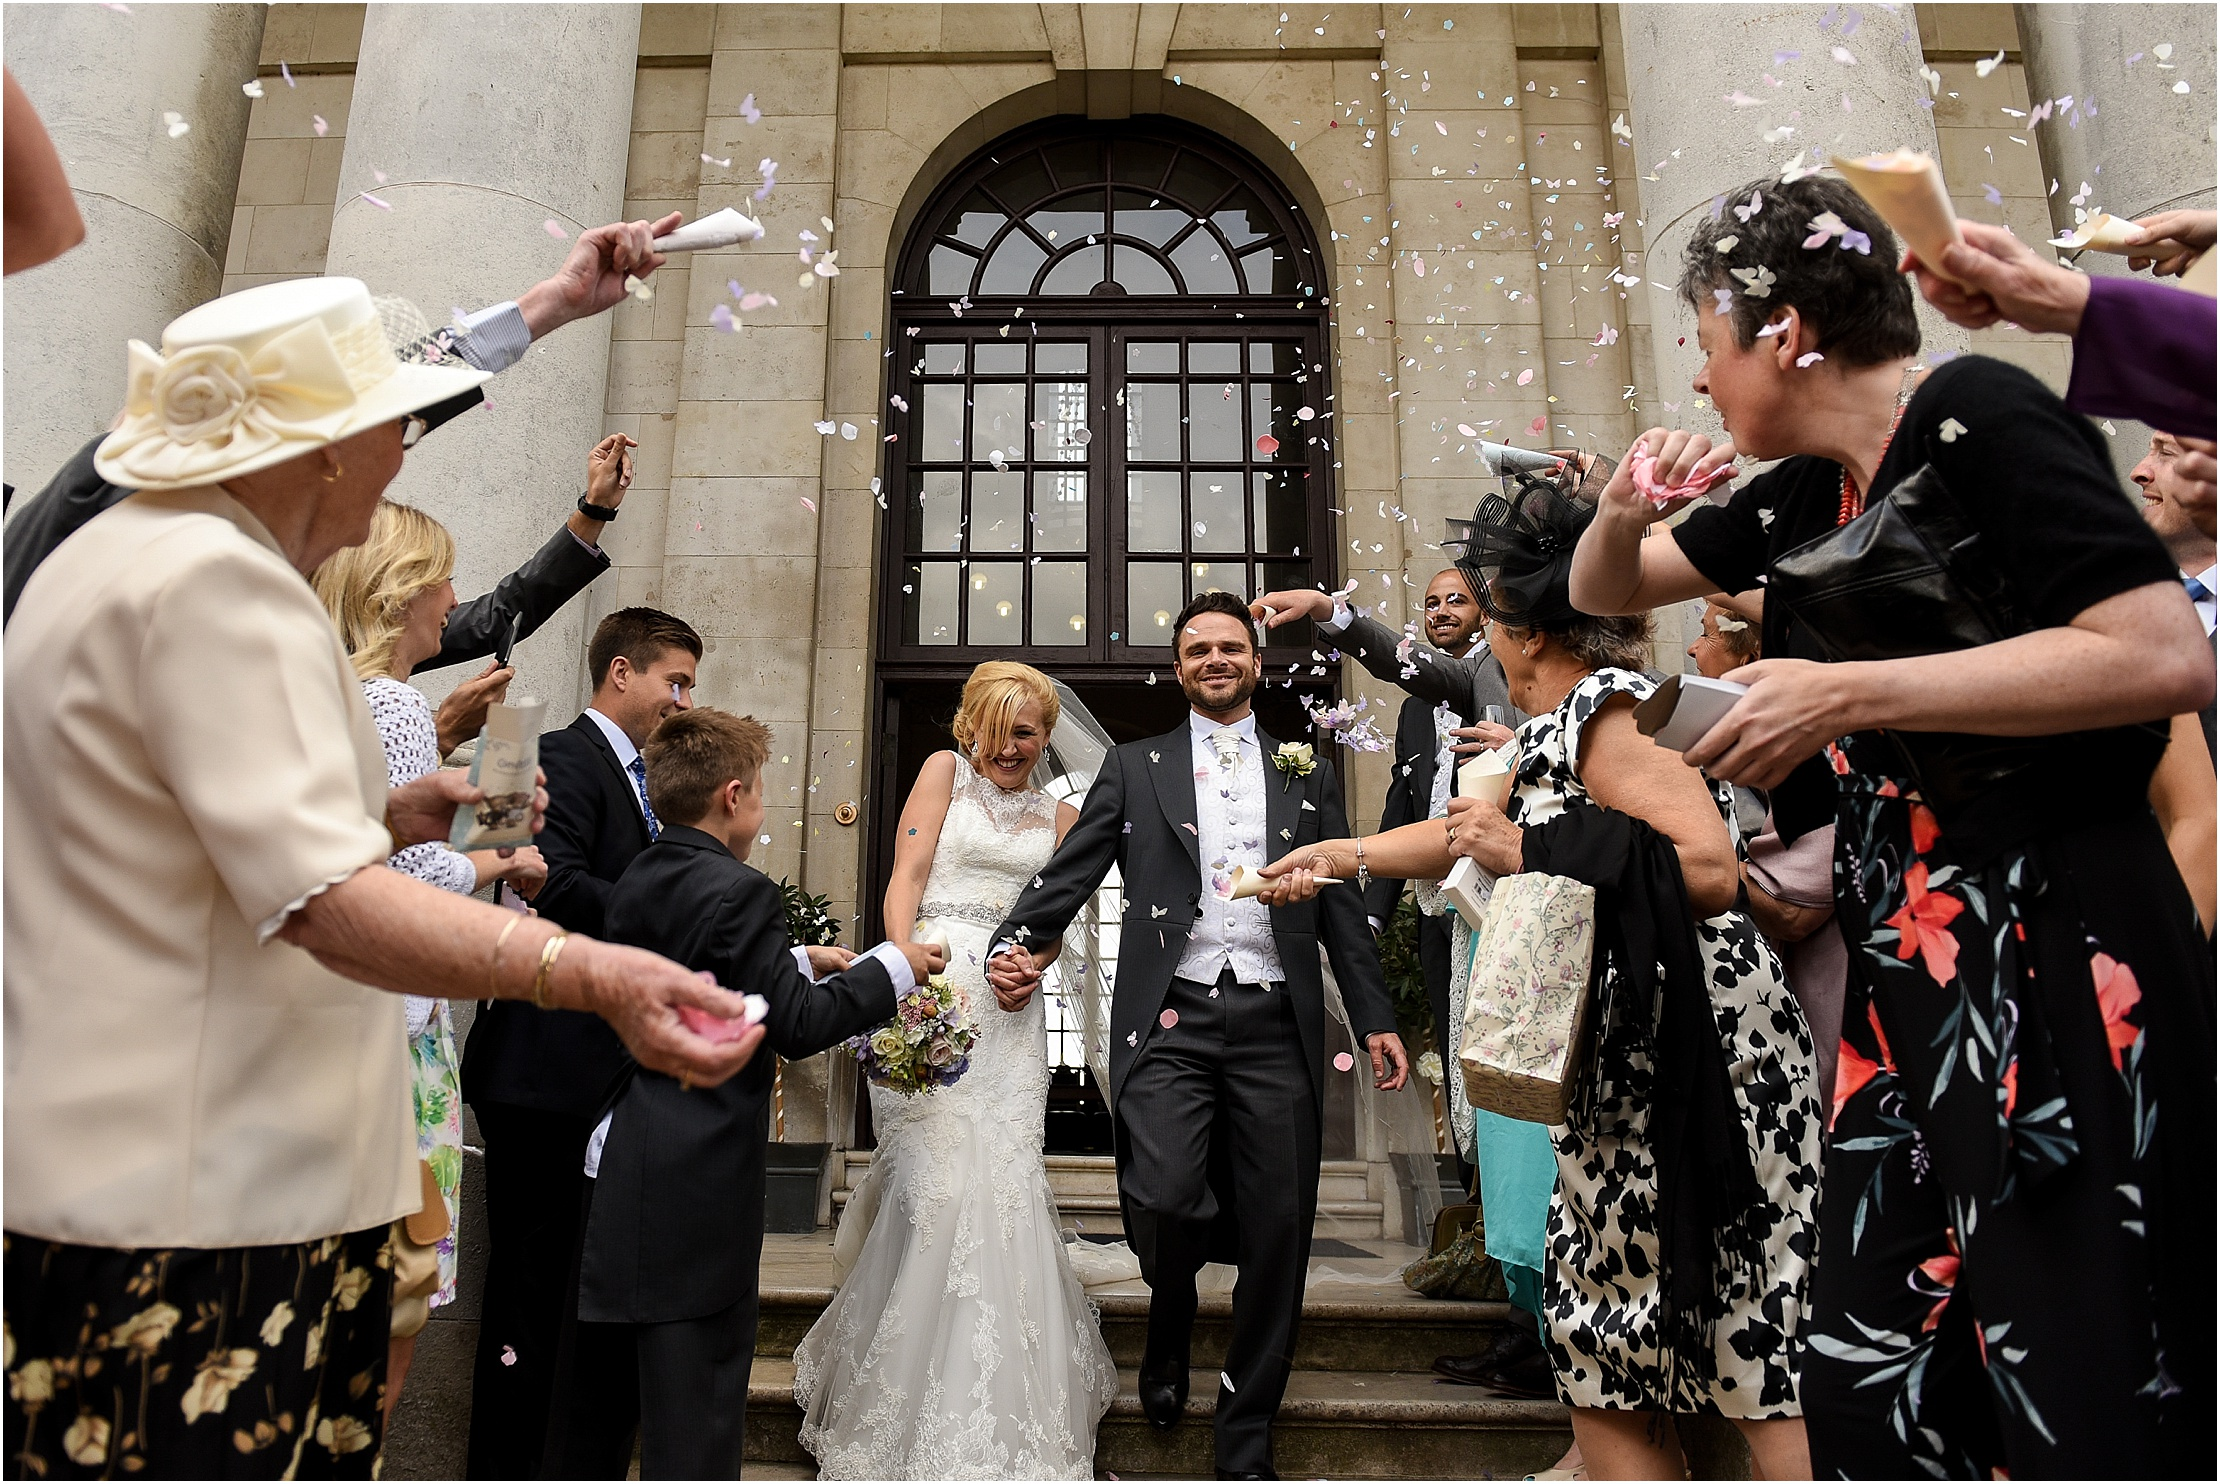 staining-lodge-wedding-075.jpg